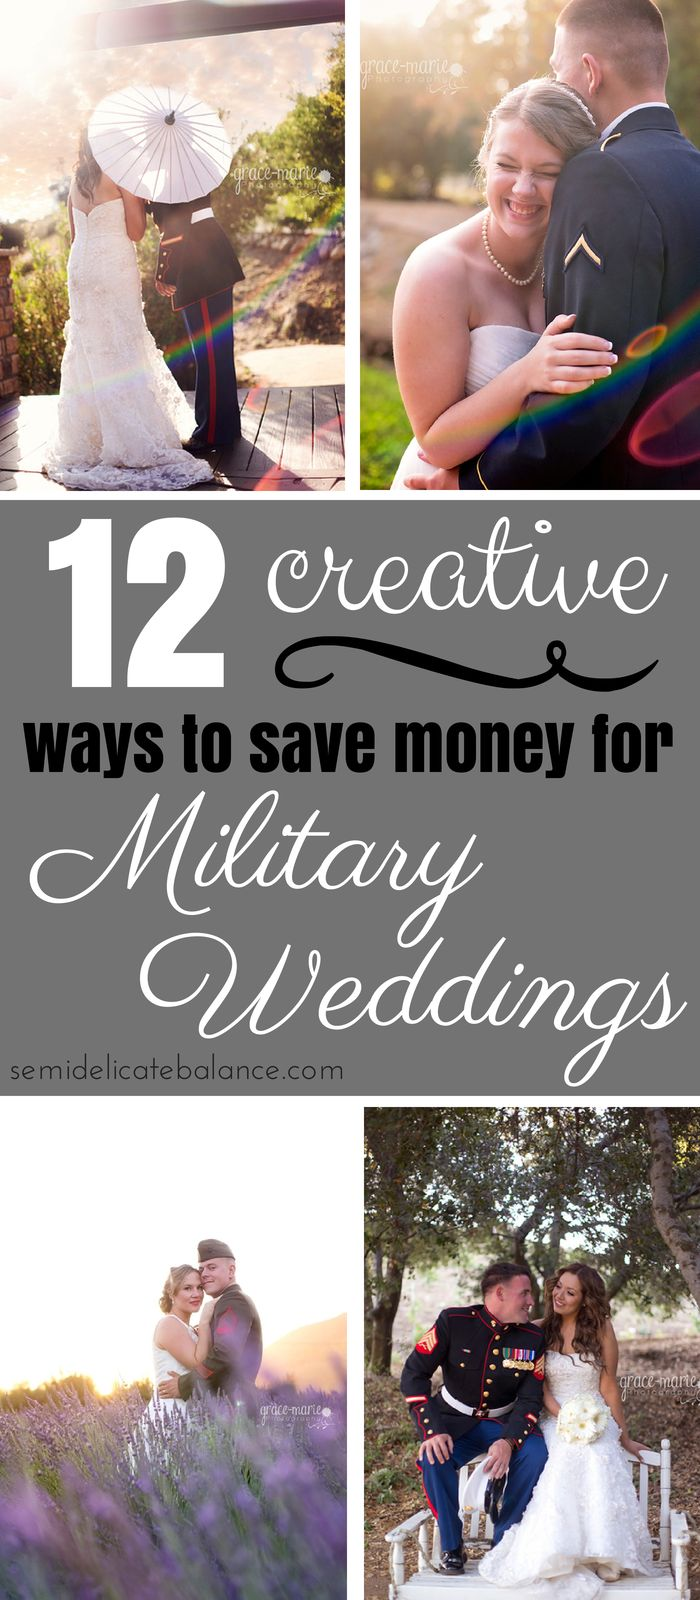 12 Creative Ways to Save Money on a Military Wedding